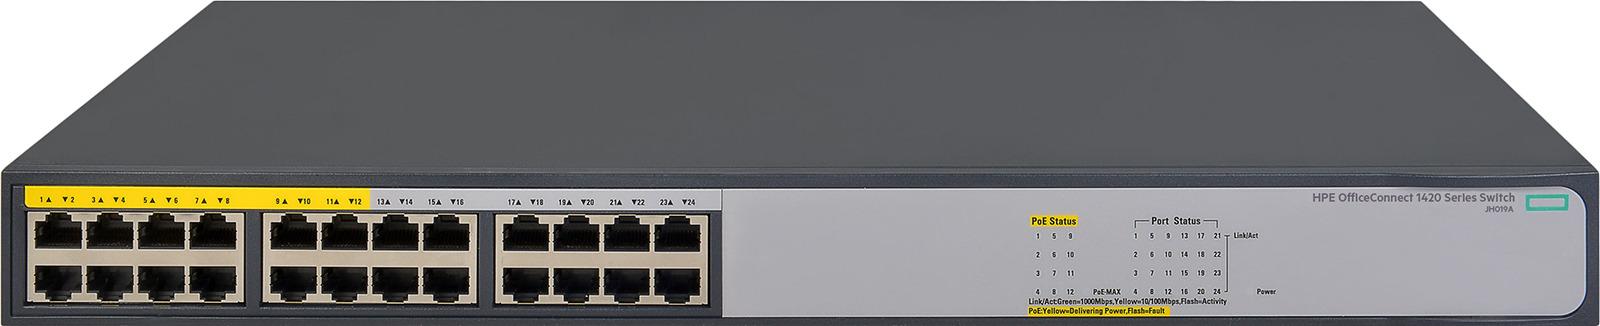 Коммутатор HPE OfficeConnect 1420, неуправляемый, JH019A коммутатор hpe officeconnect 1420 неуправляемый jh330a